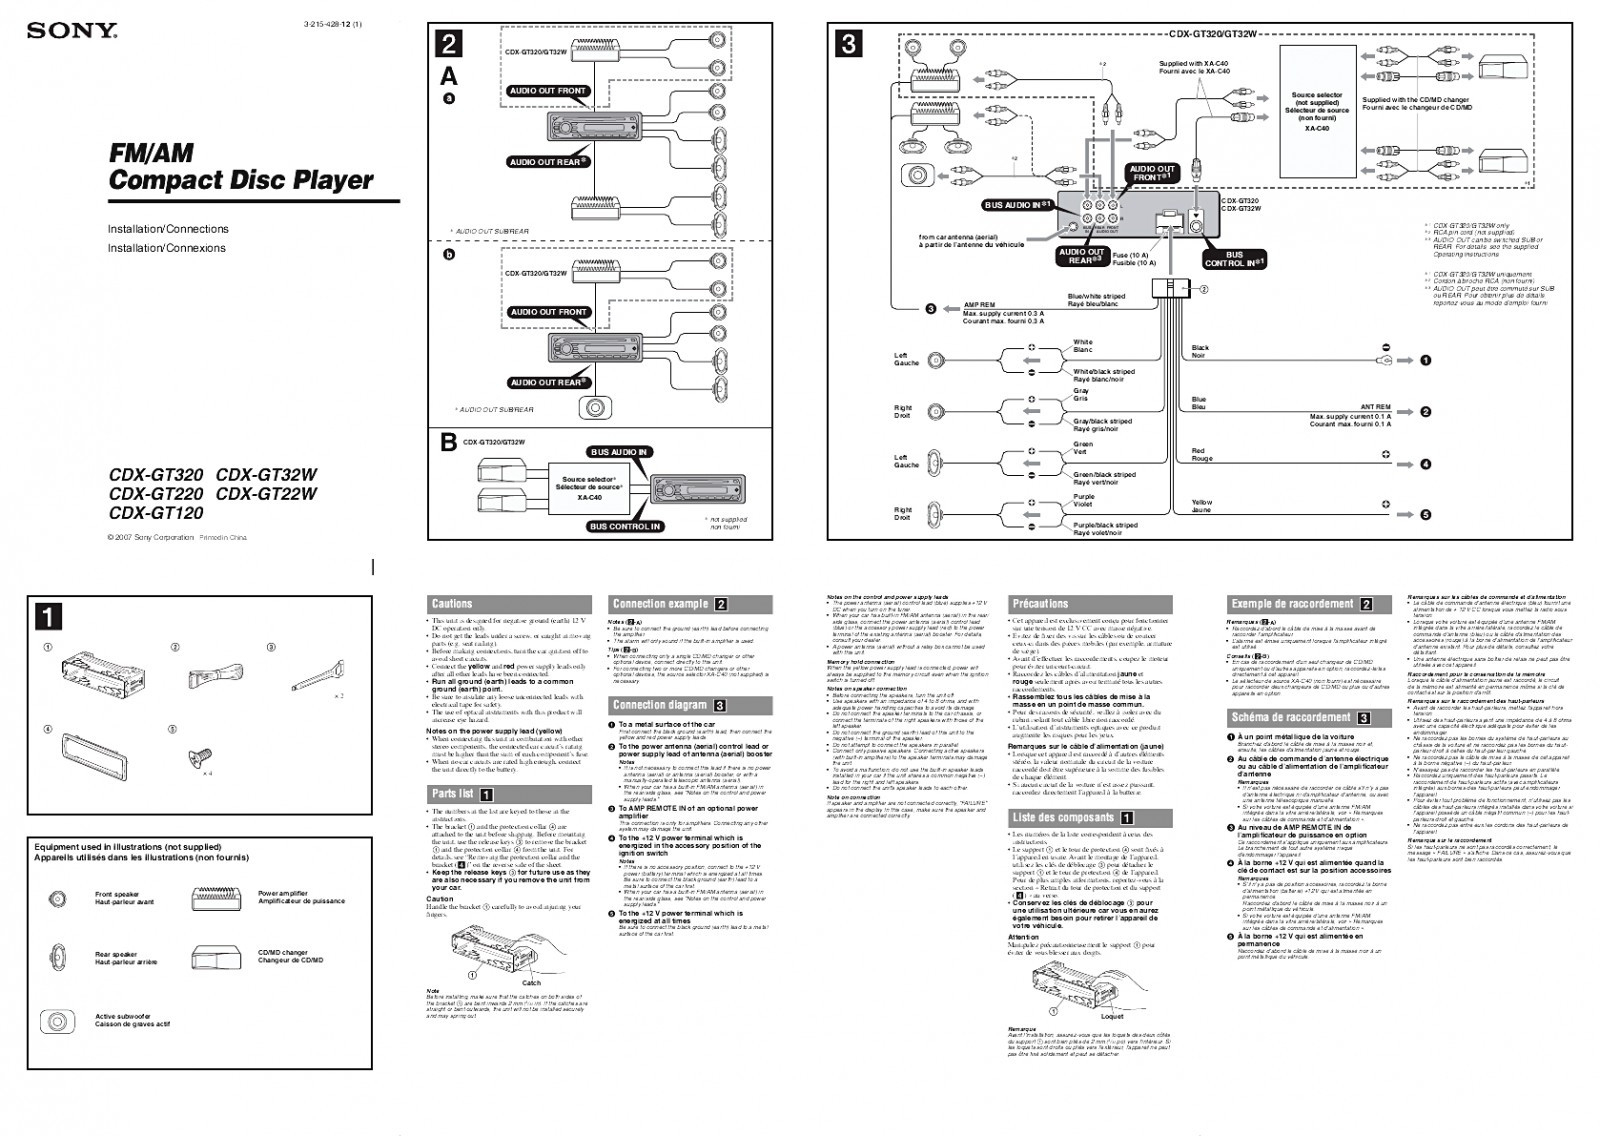 Pioneer Avh X2800Bs Wiring Diagram For Ranger | Manual E-Books - Pioneer Avh X2800Bs Wiring Diagram